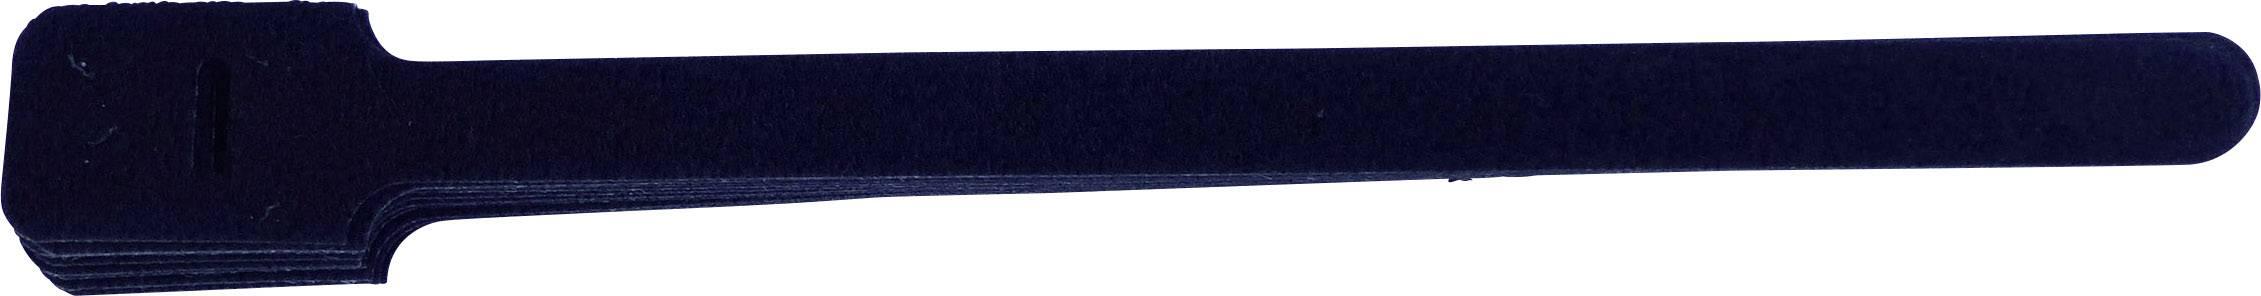 Na naskrutkovanie káblový manažér na suchý zips TRU COMPONENTS 894-008-Bag, (d x š) 225 mm x 13 mm, 10 ks